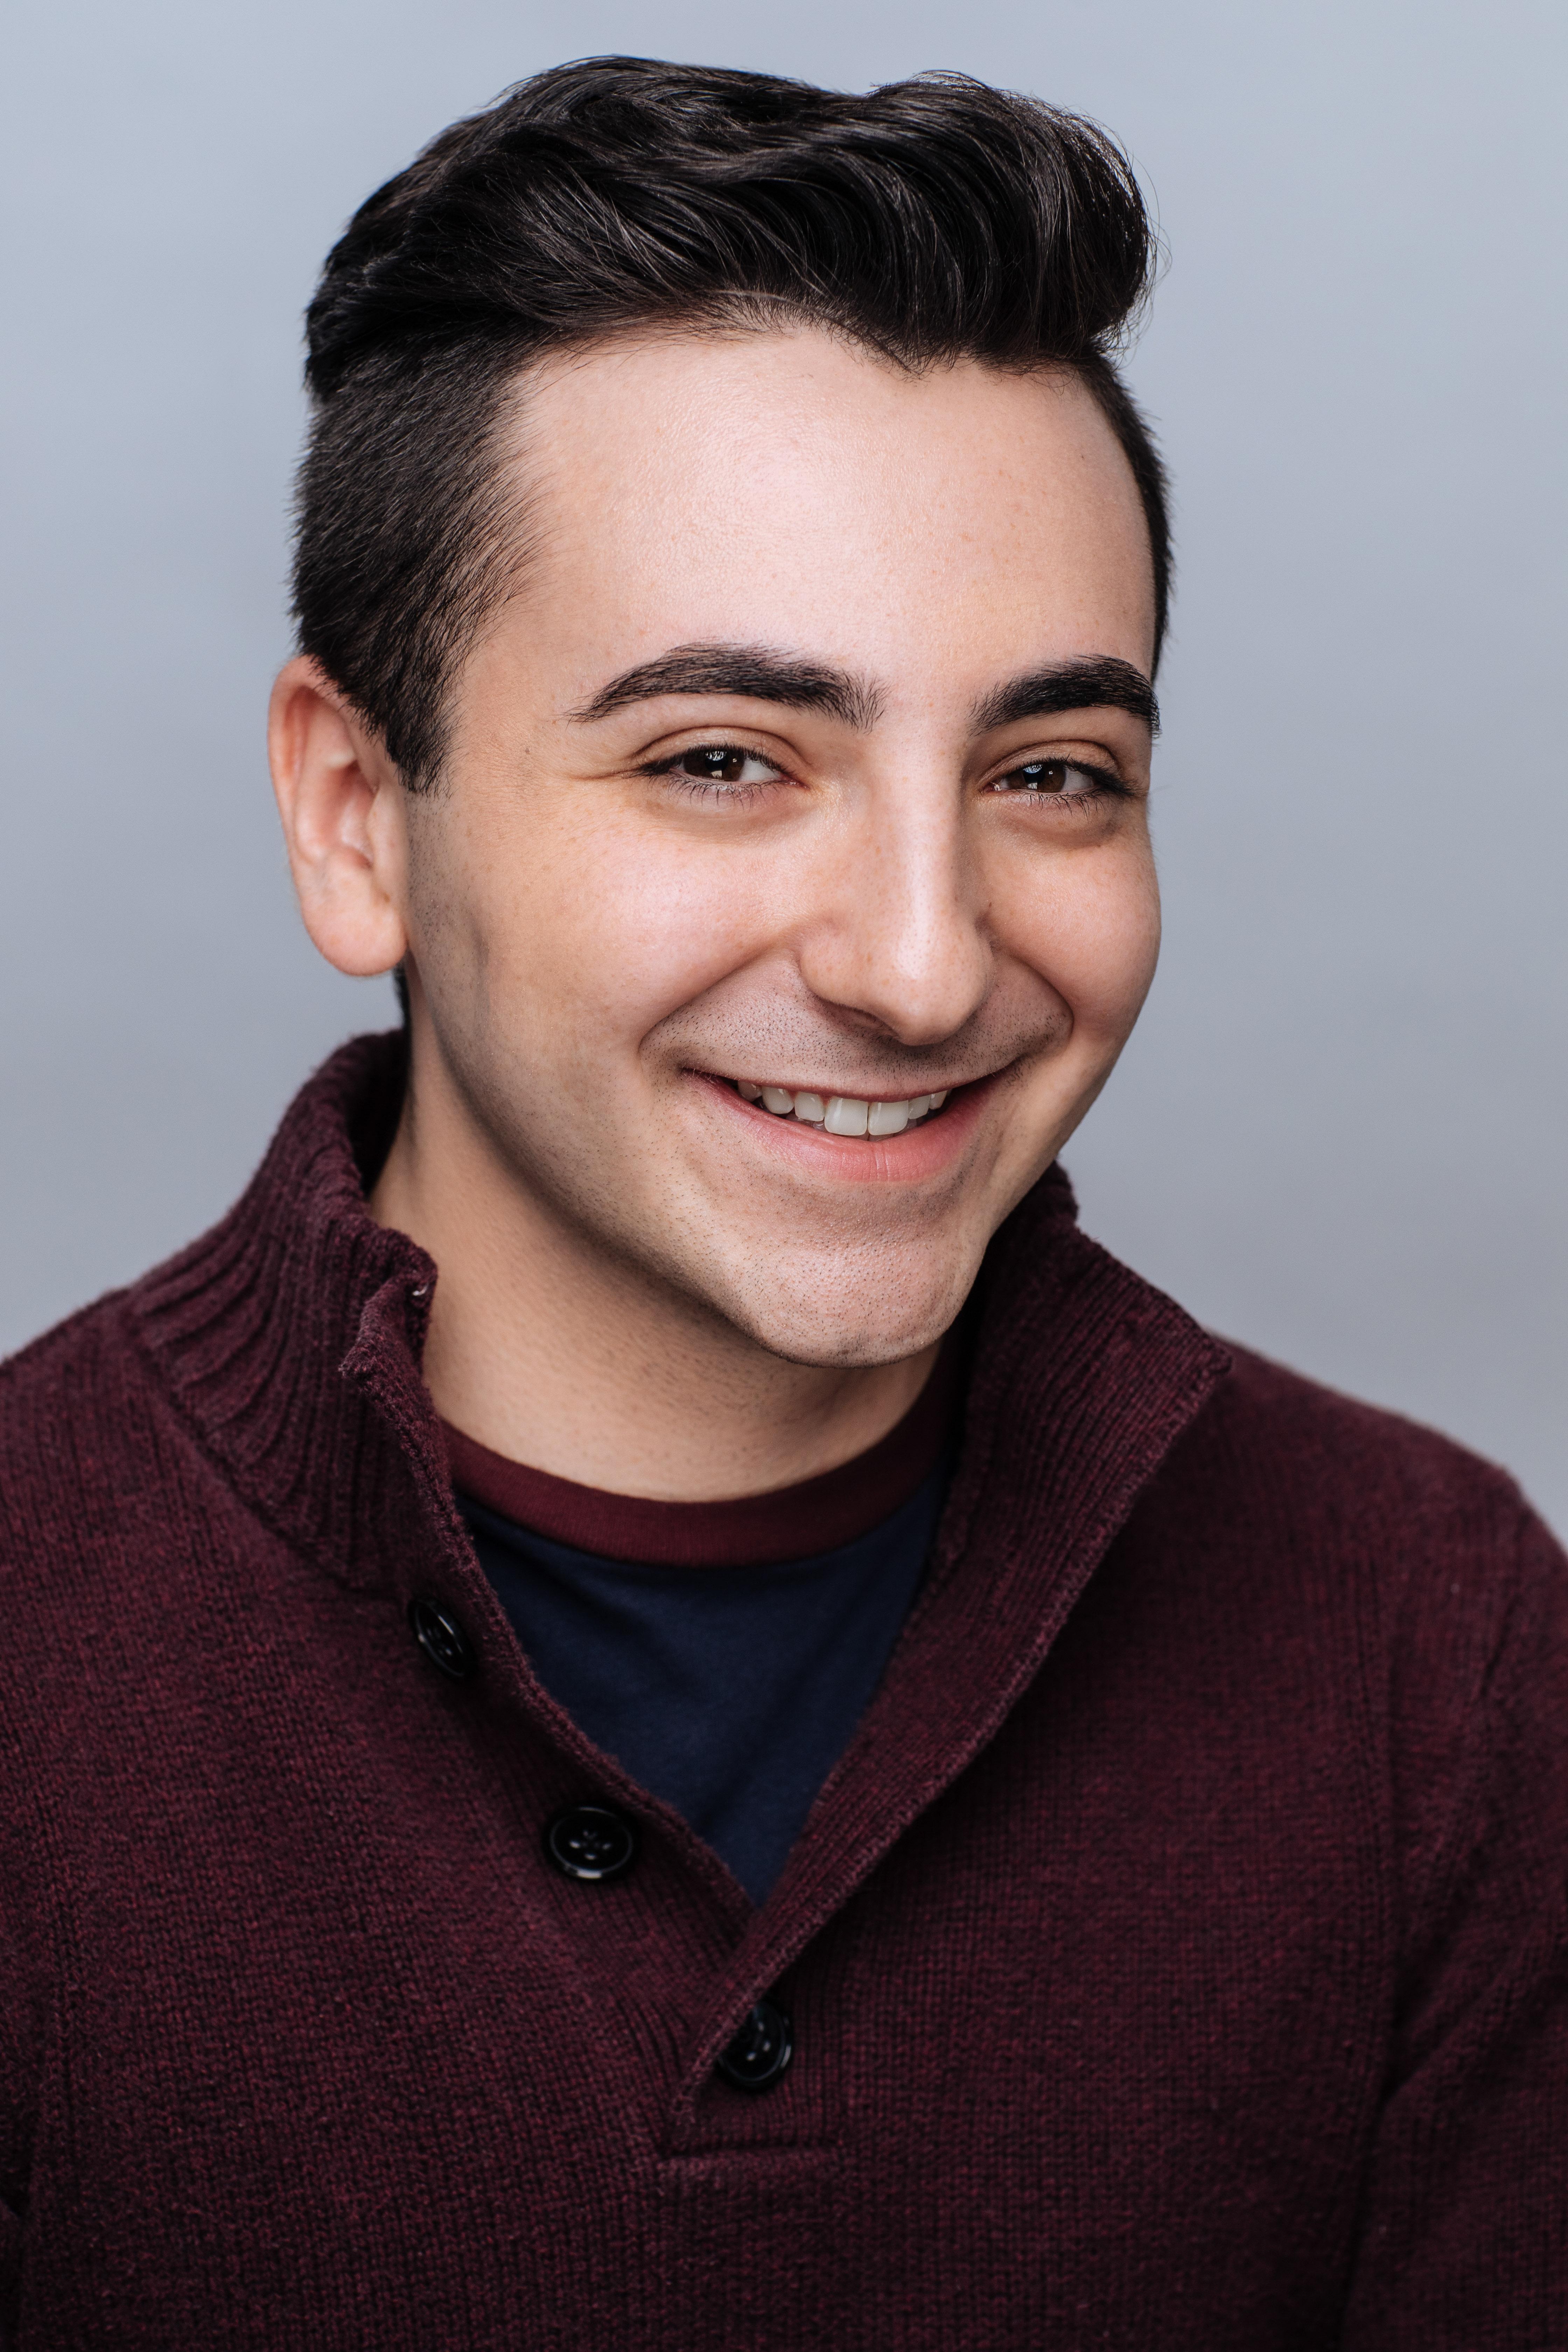 Jake Aboyoun